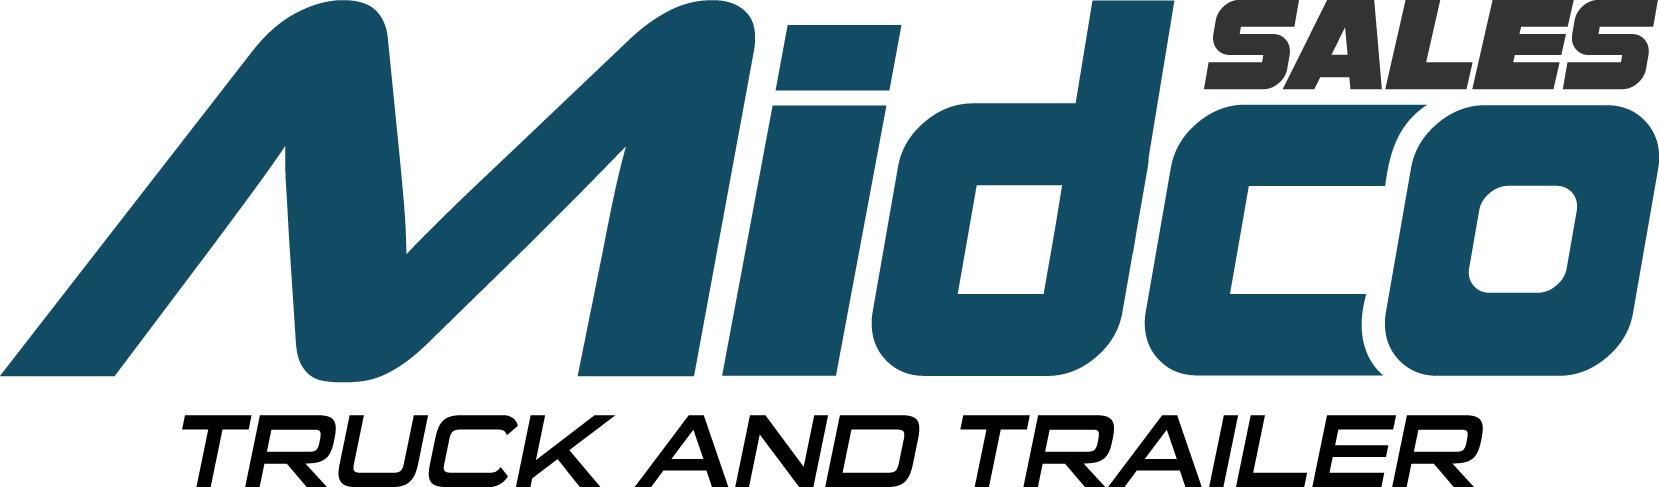 Midco Sales company logo